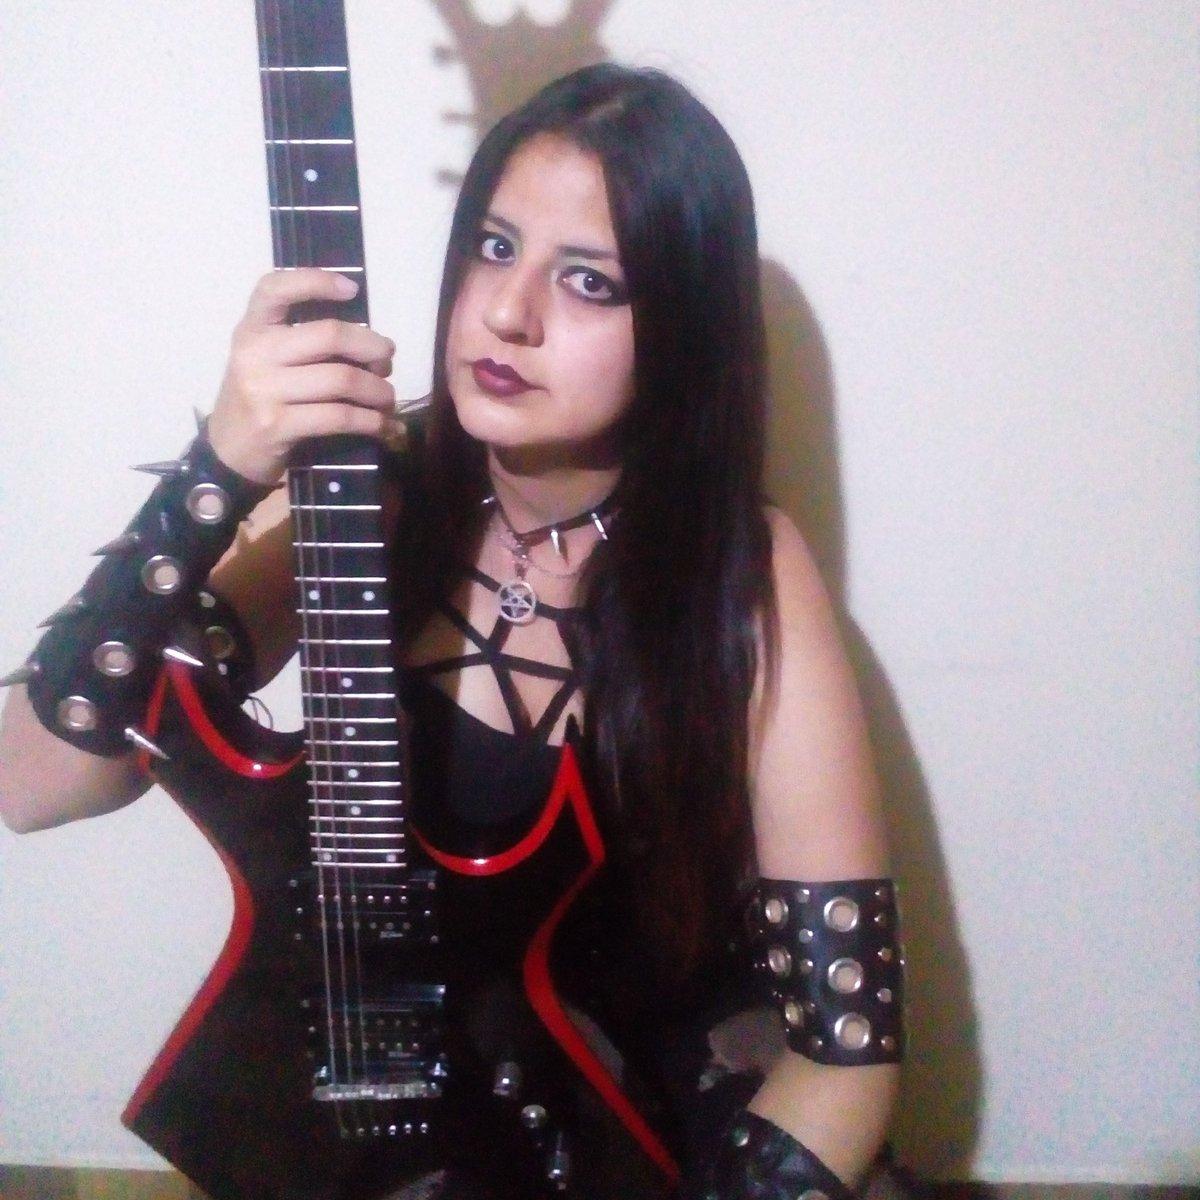 #aghory #femaleguitarist #guitarist #blackmetal #extrememetal #metalhead #metalwoman #vocalist #metalcolombia #MetalMusicpic.twitter.com/Xvt0yuqsfT